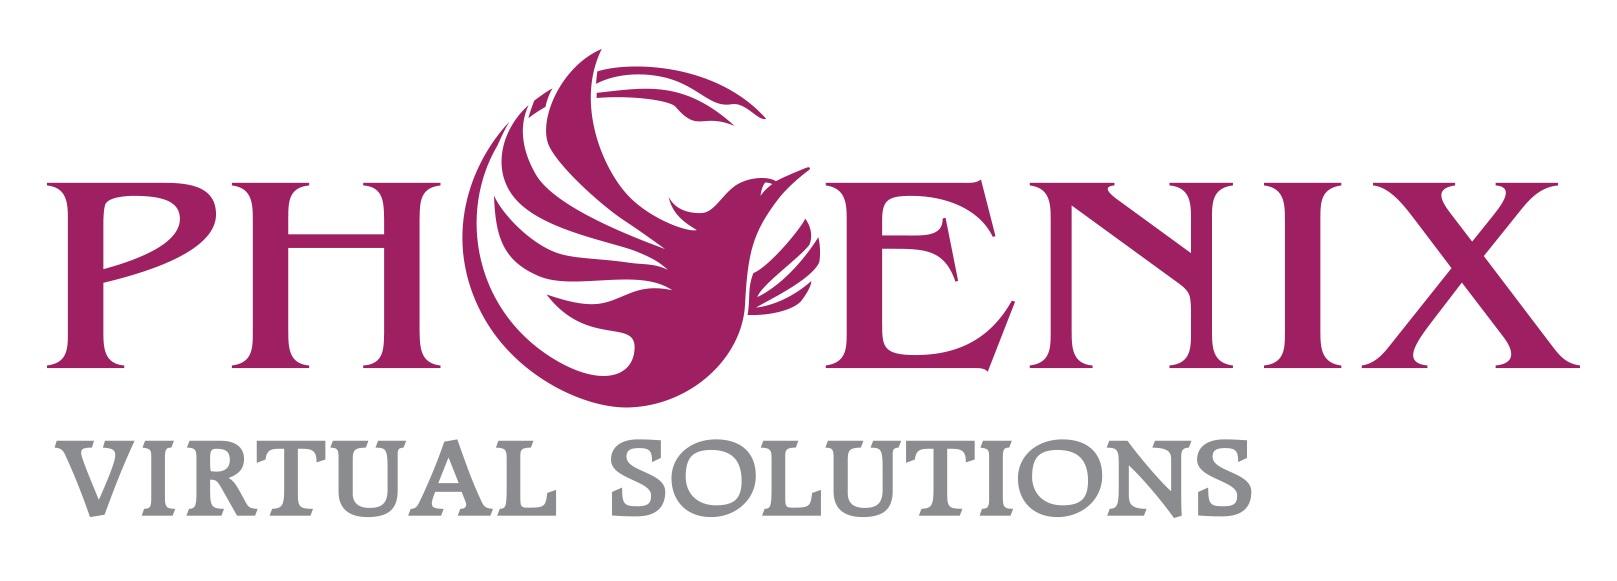 Phoenix Virtual Solutions